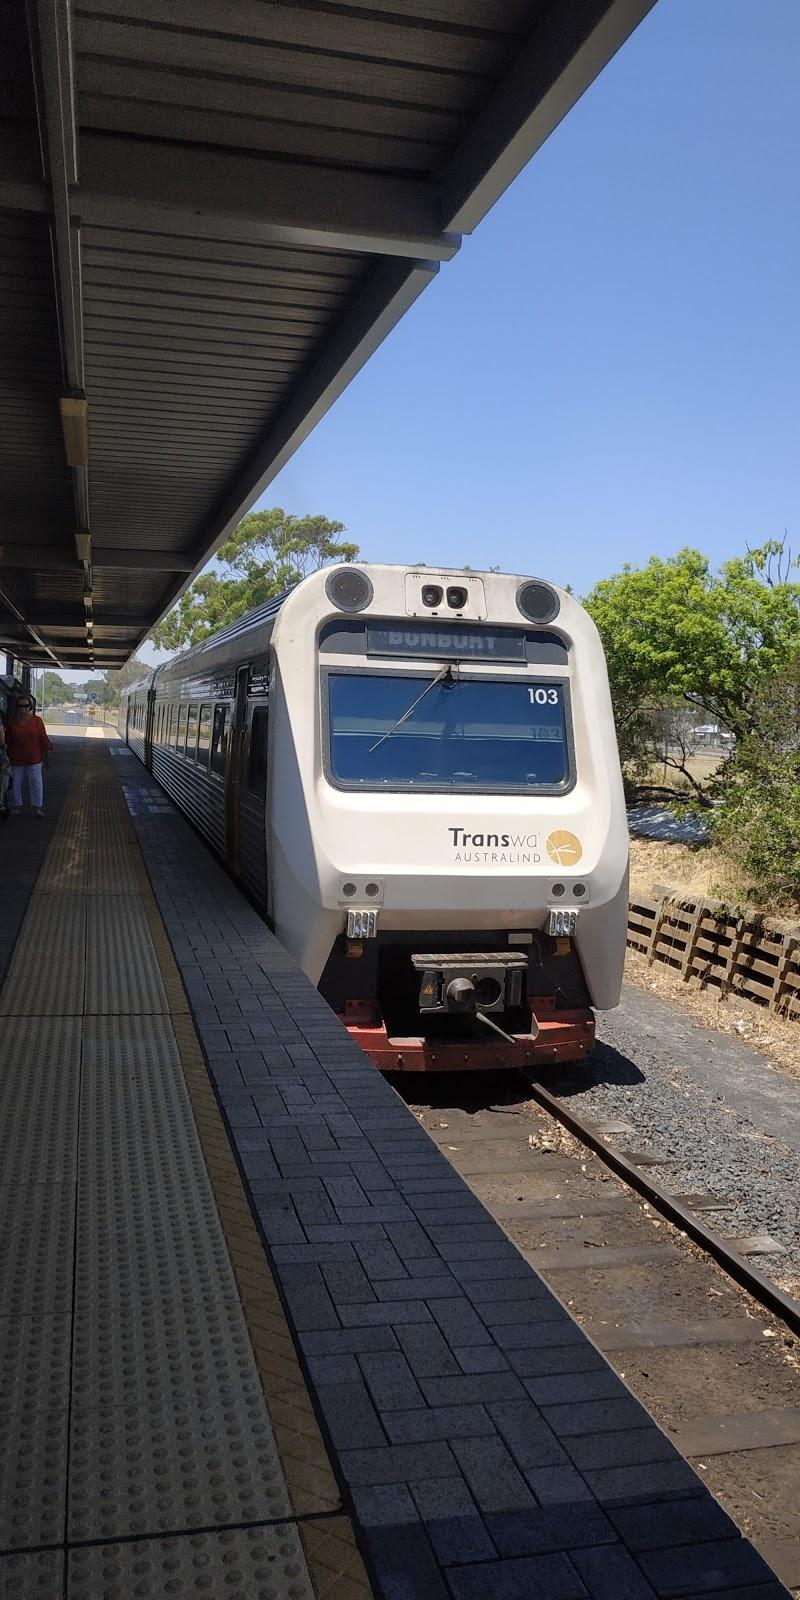 Train Station Car Park | parking | 4 Picton Rd, East Bunbury WA 6230, Australia